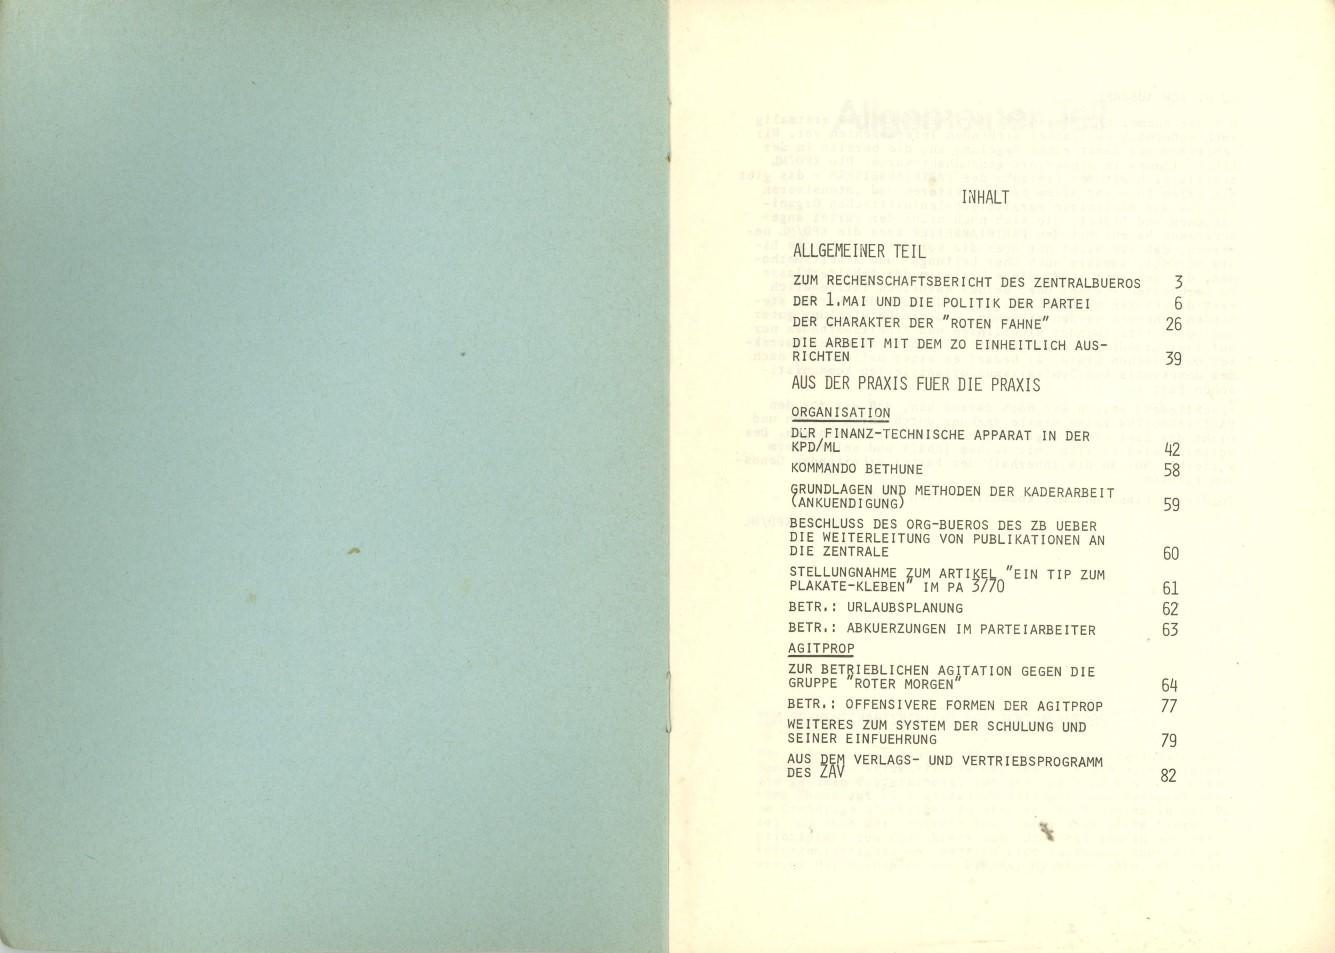 ZB_Parteiarbeiter_1971_06_02